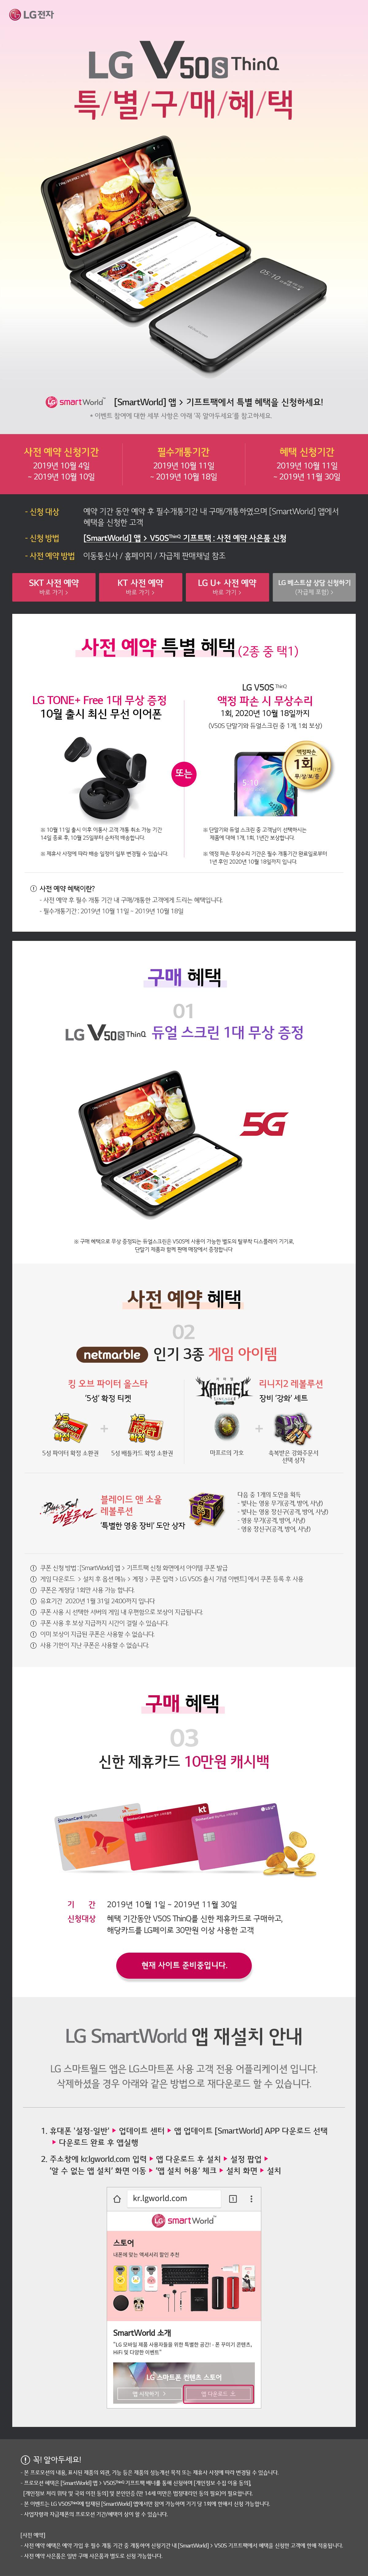 LG ThinQ 예약 구매 혜택 이미지